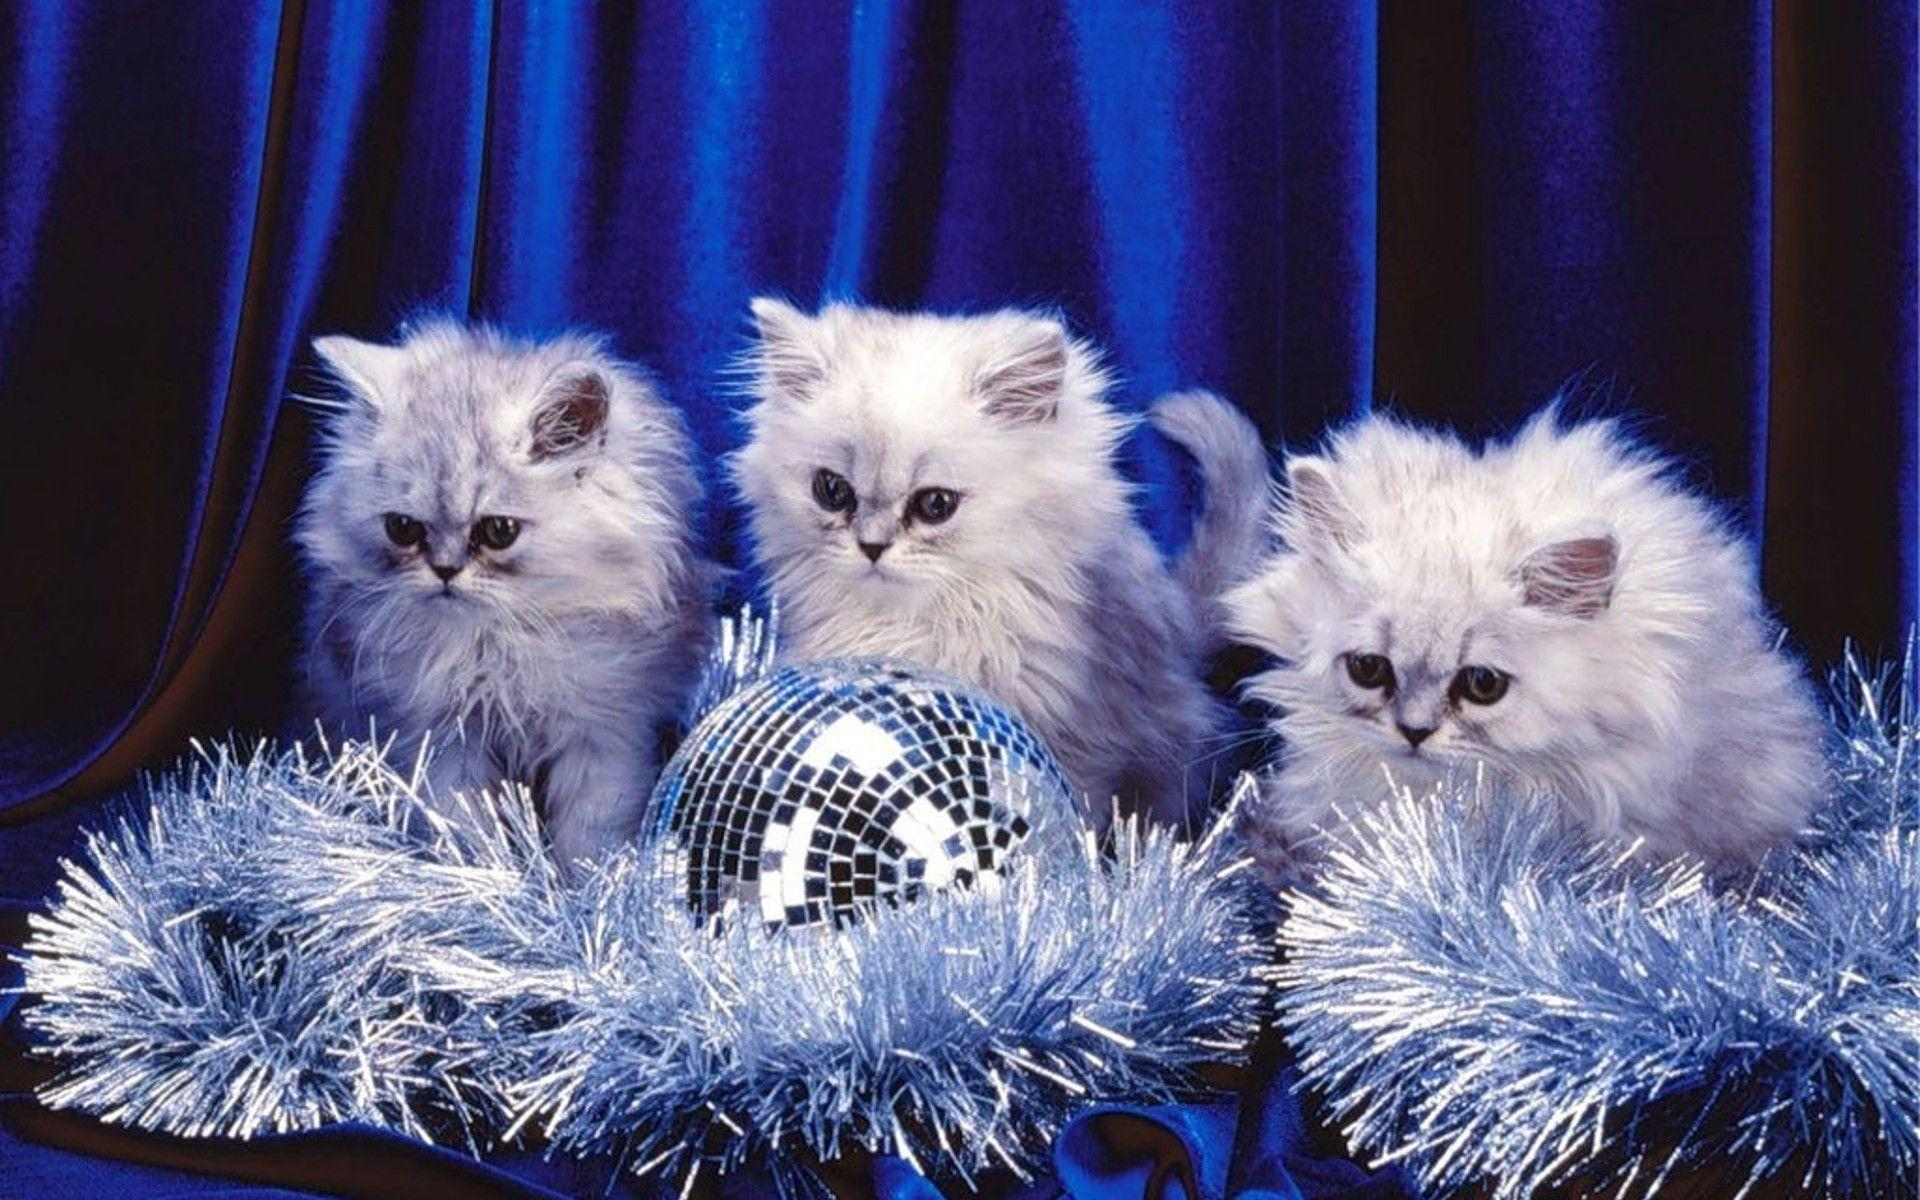 Kittens Wallpapers 1920x1200